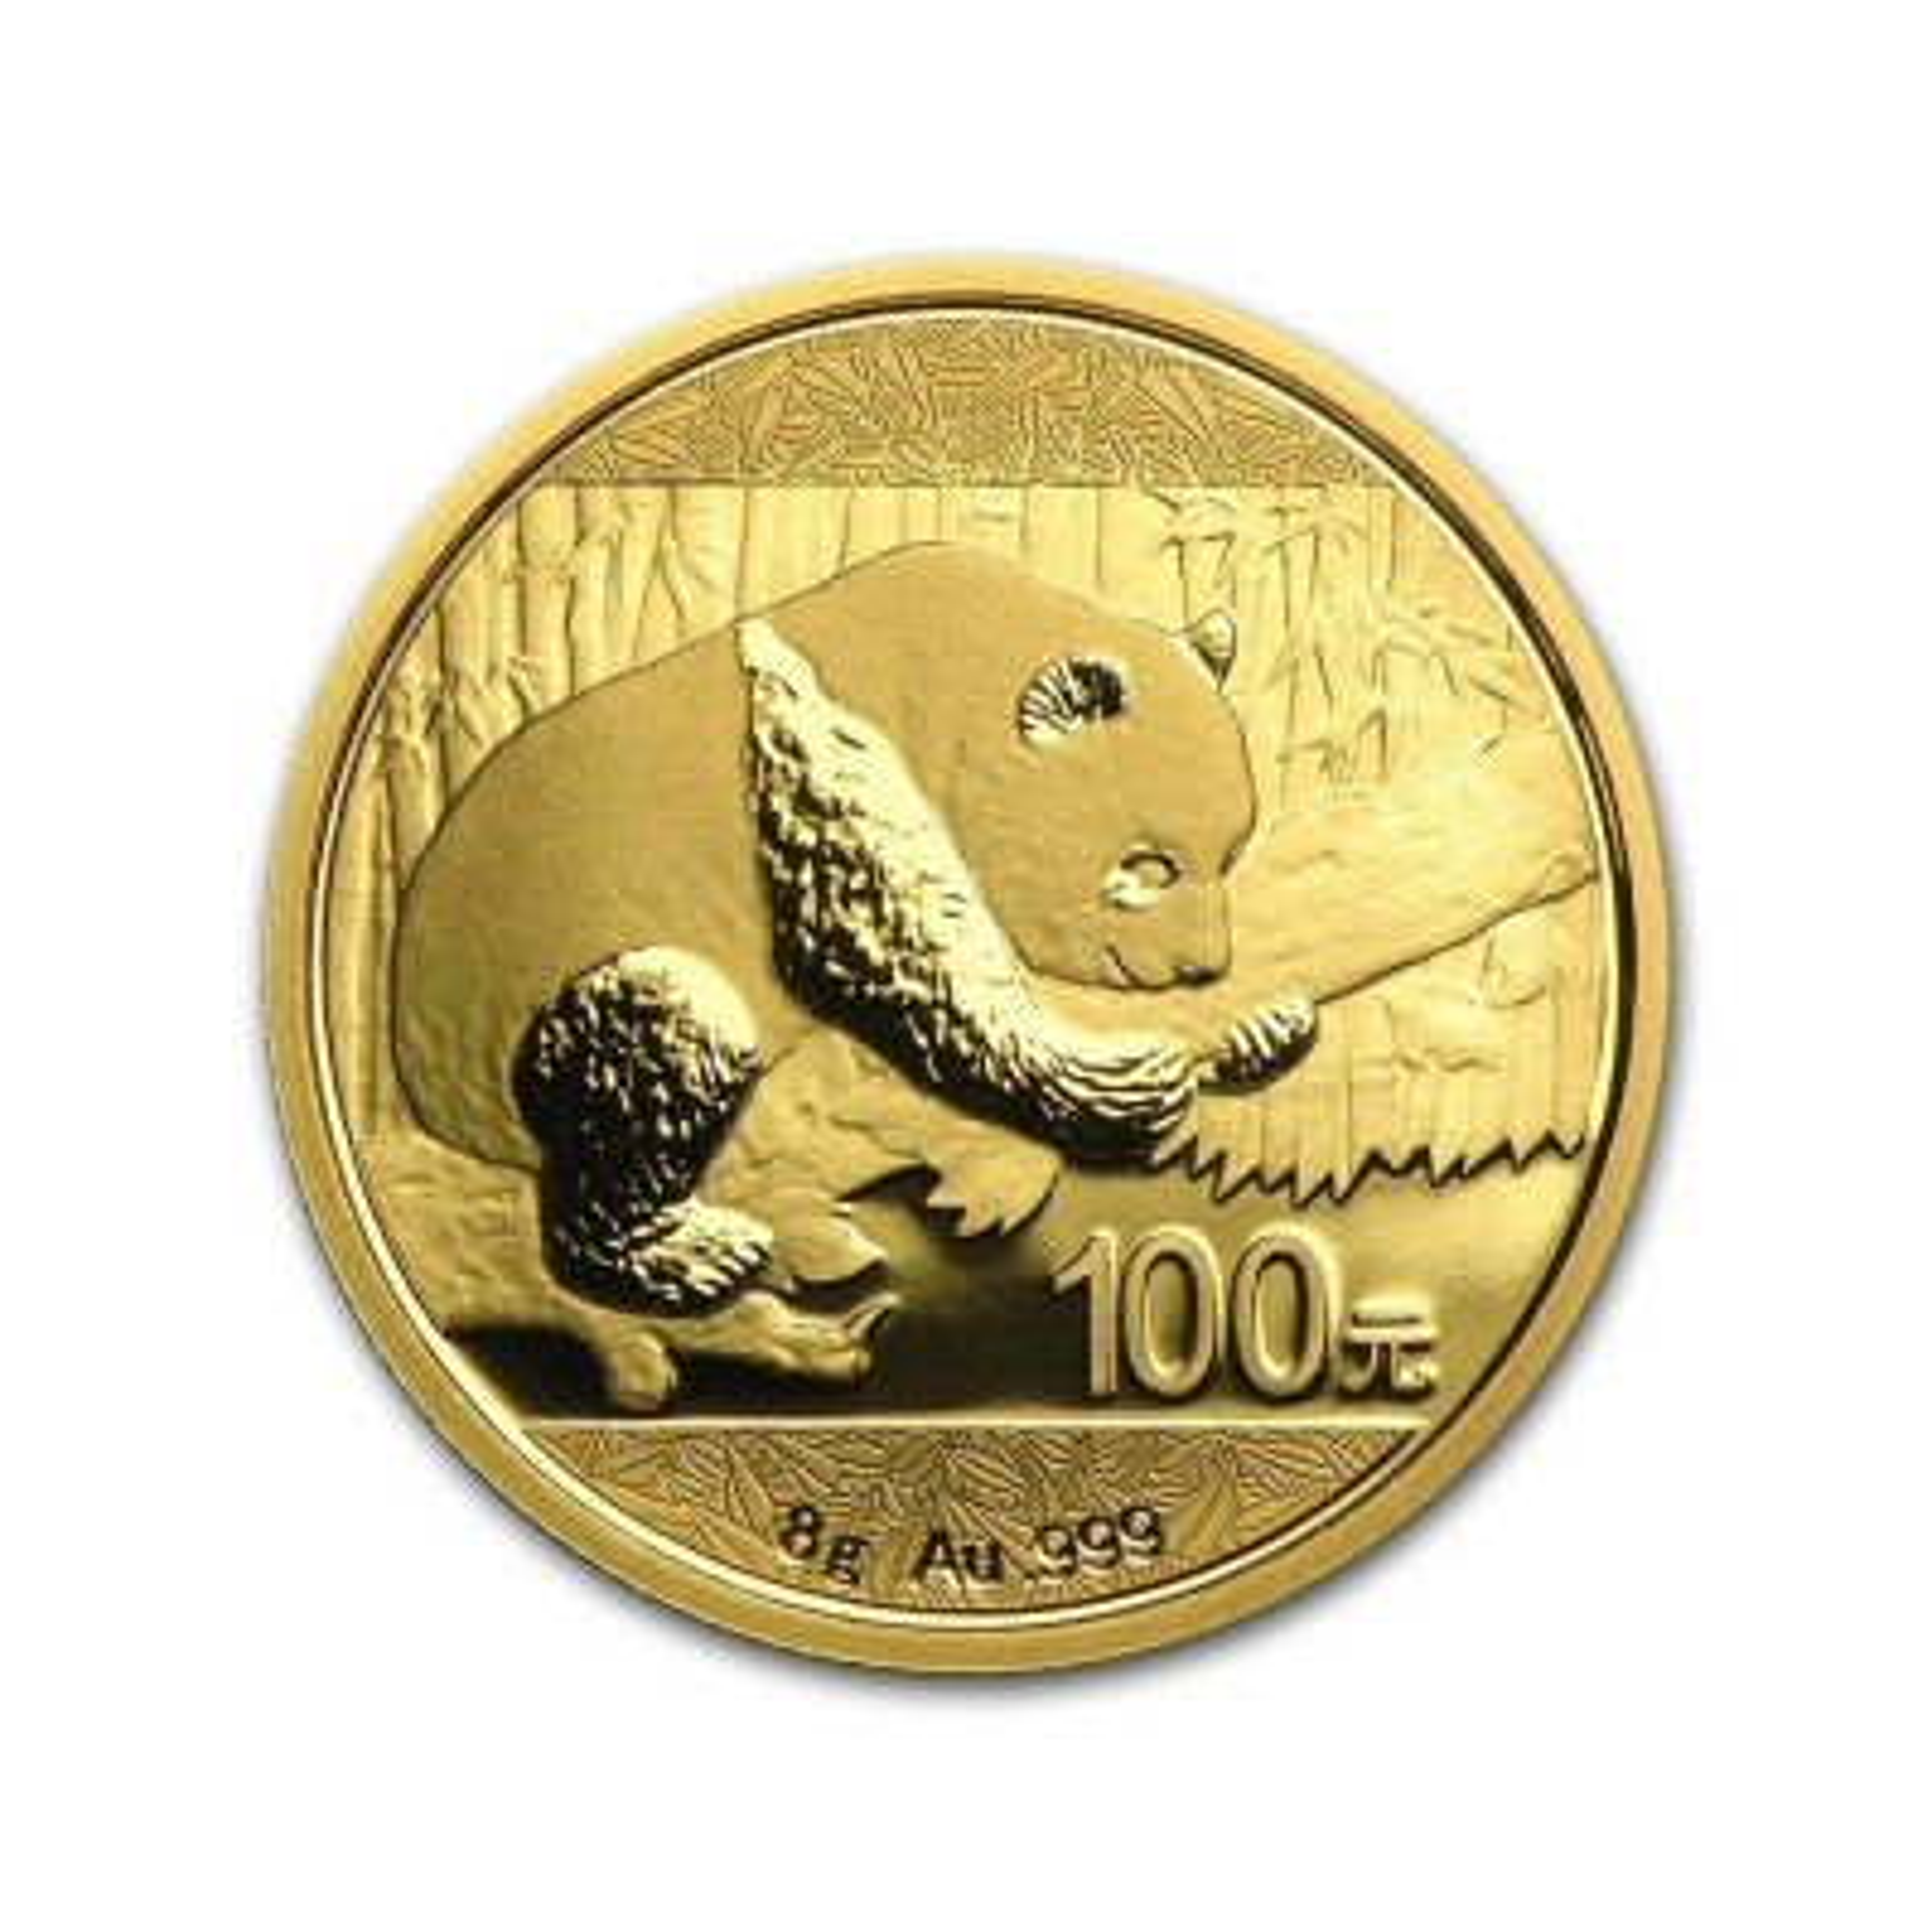 8 Gram gouden Panda munt 2016